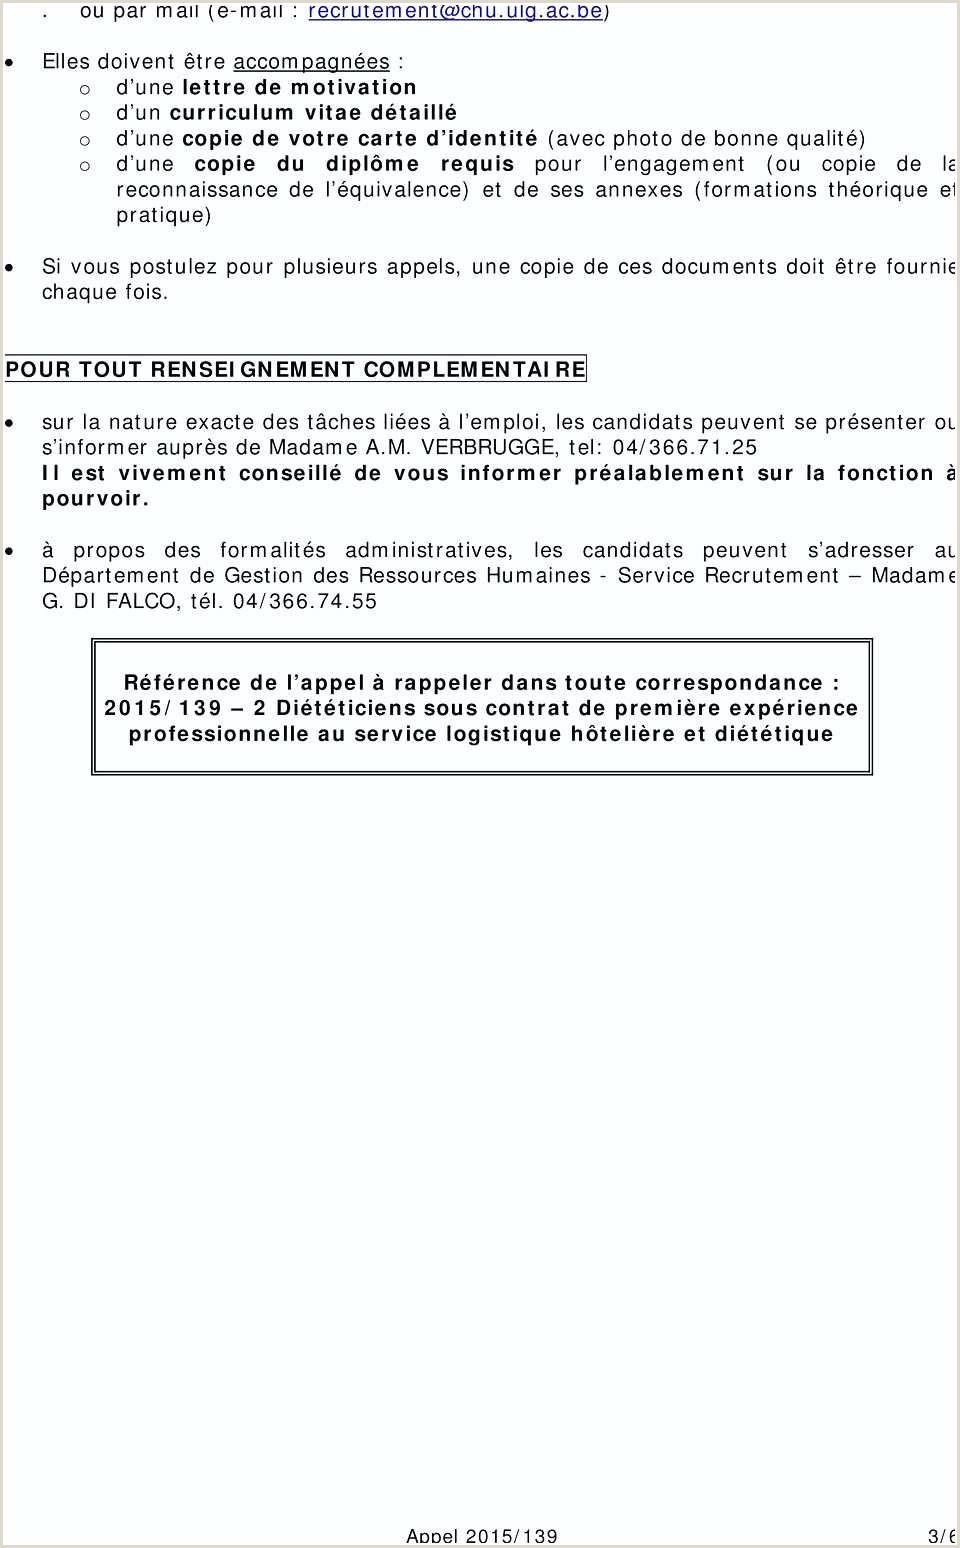 Exemple Cv Cuisinier Frais Matrice De Cv taskmastersite